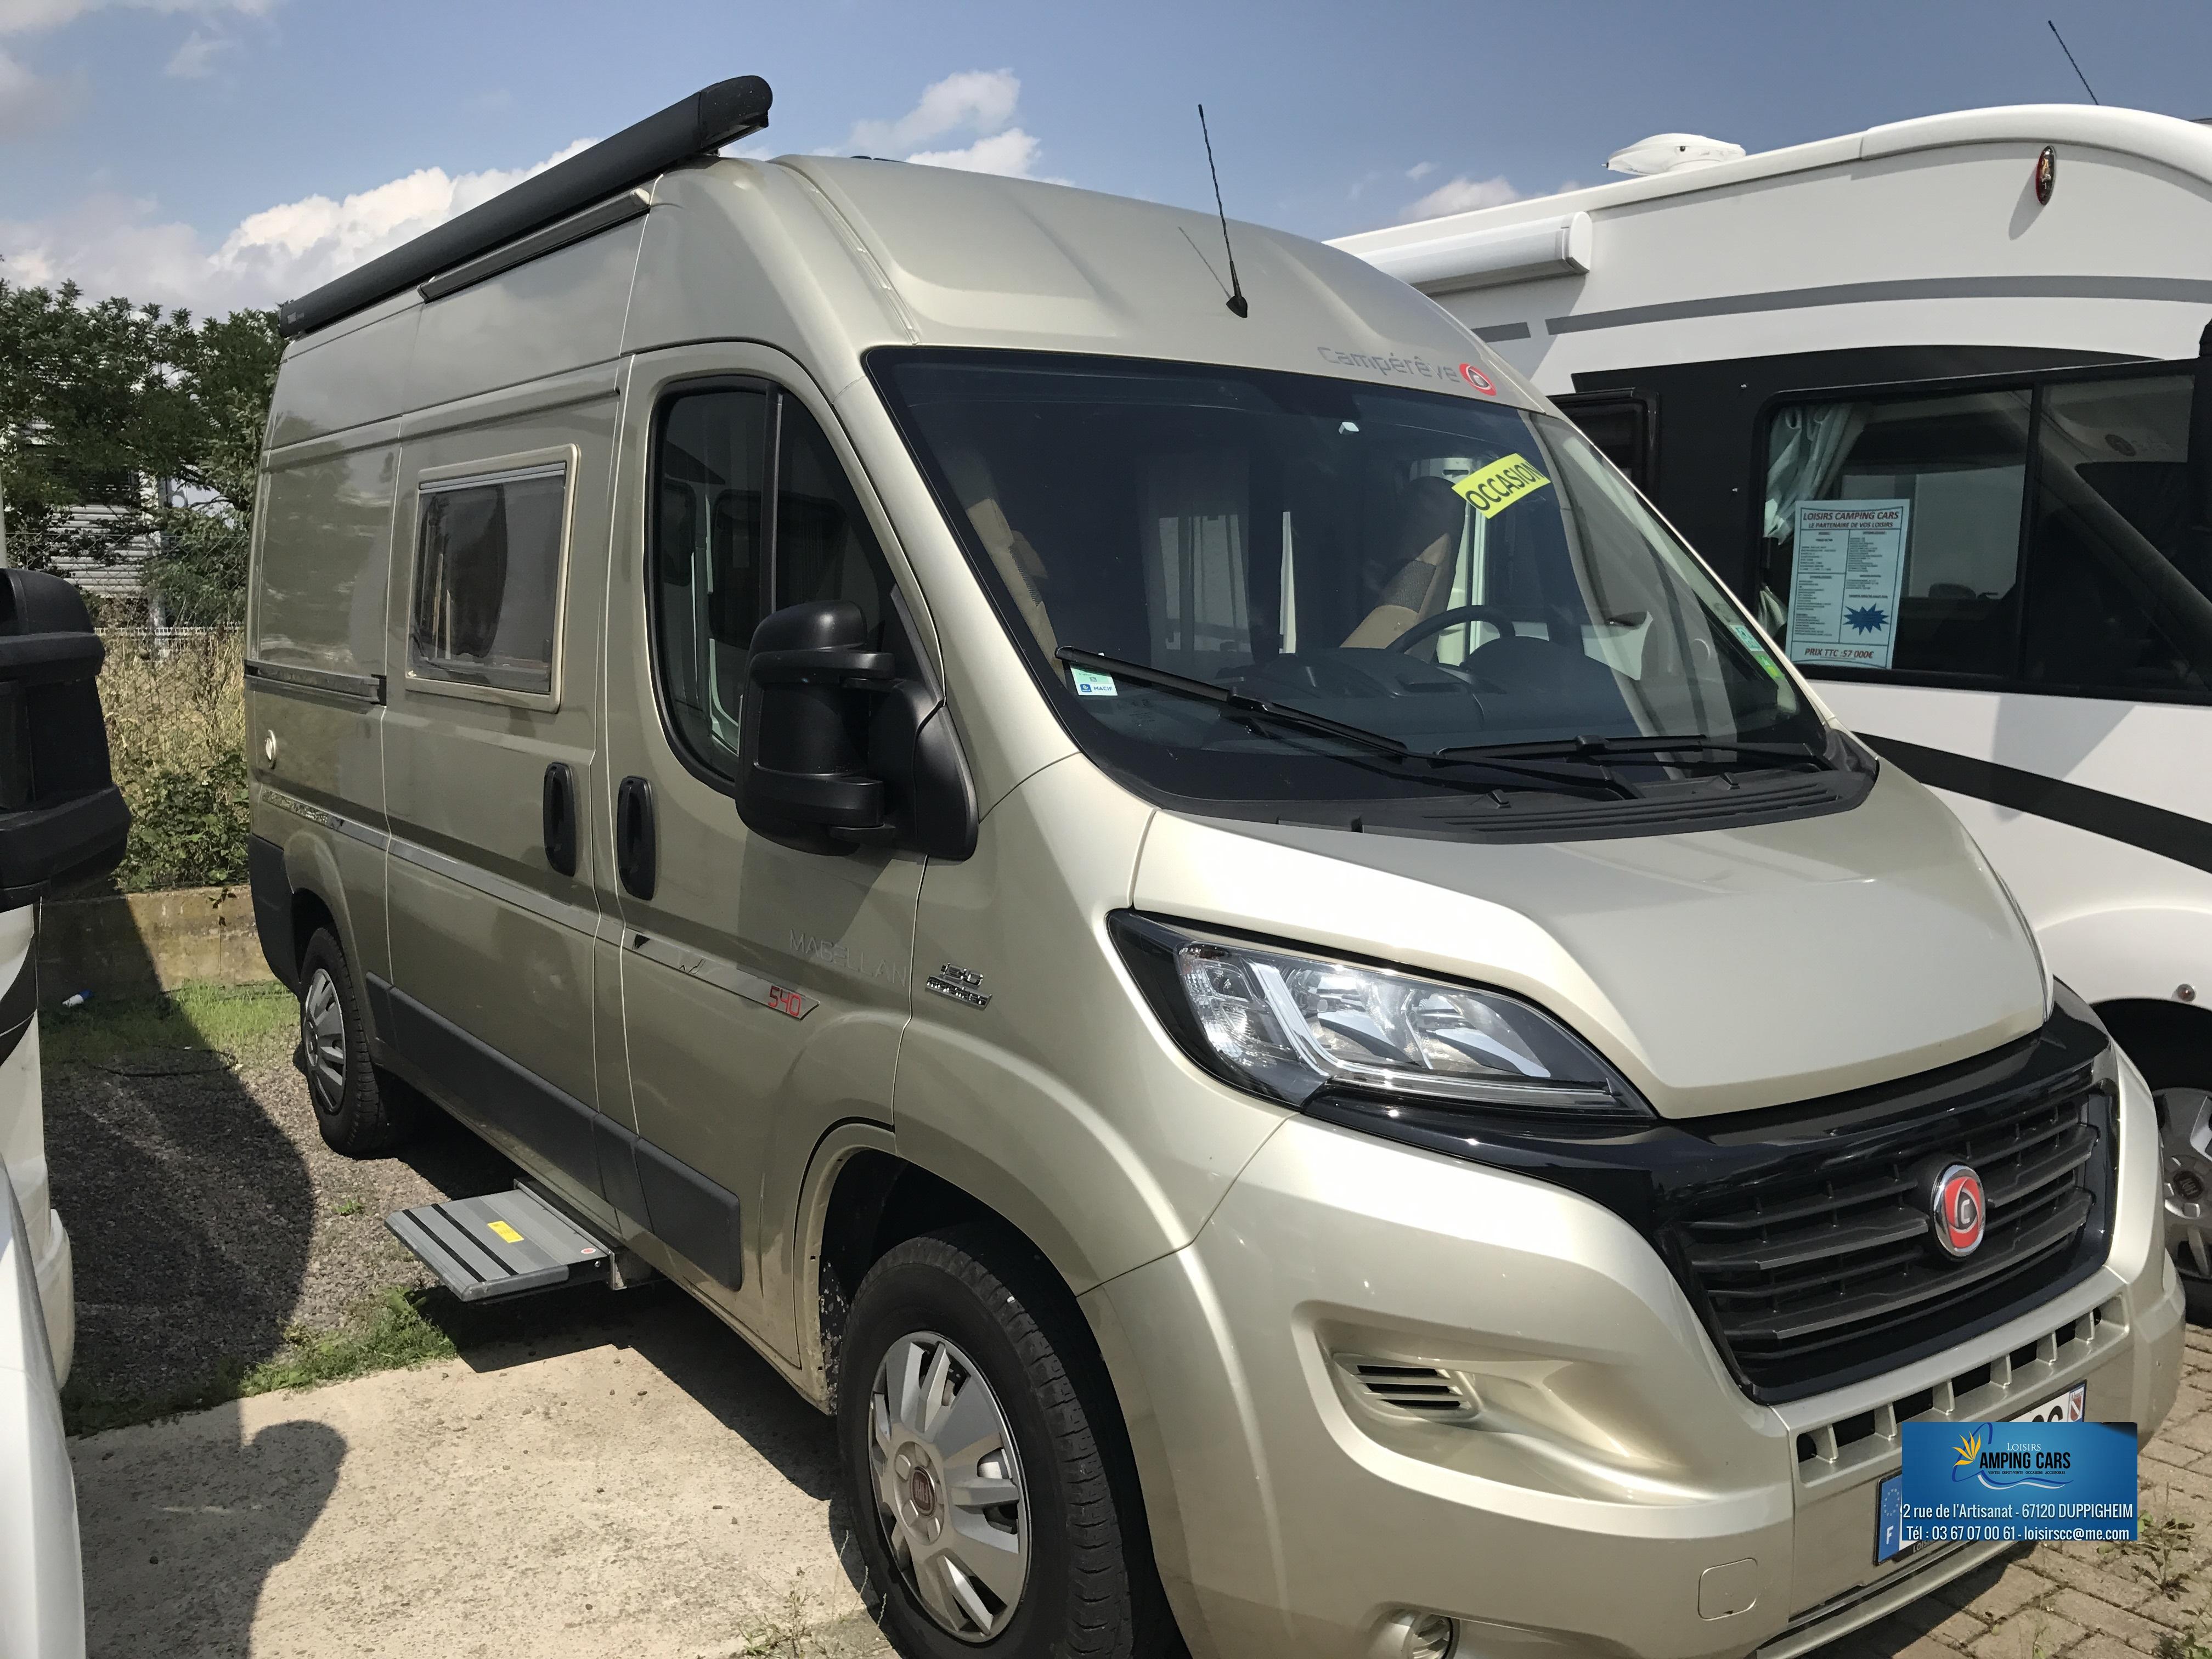 campereve magellan 540 occasion de 2016 fiat camping car en vente duppigheim rhin 67. Black Bedroom Furniture Sets. Home Design Ideas